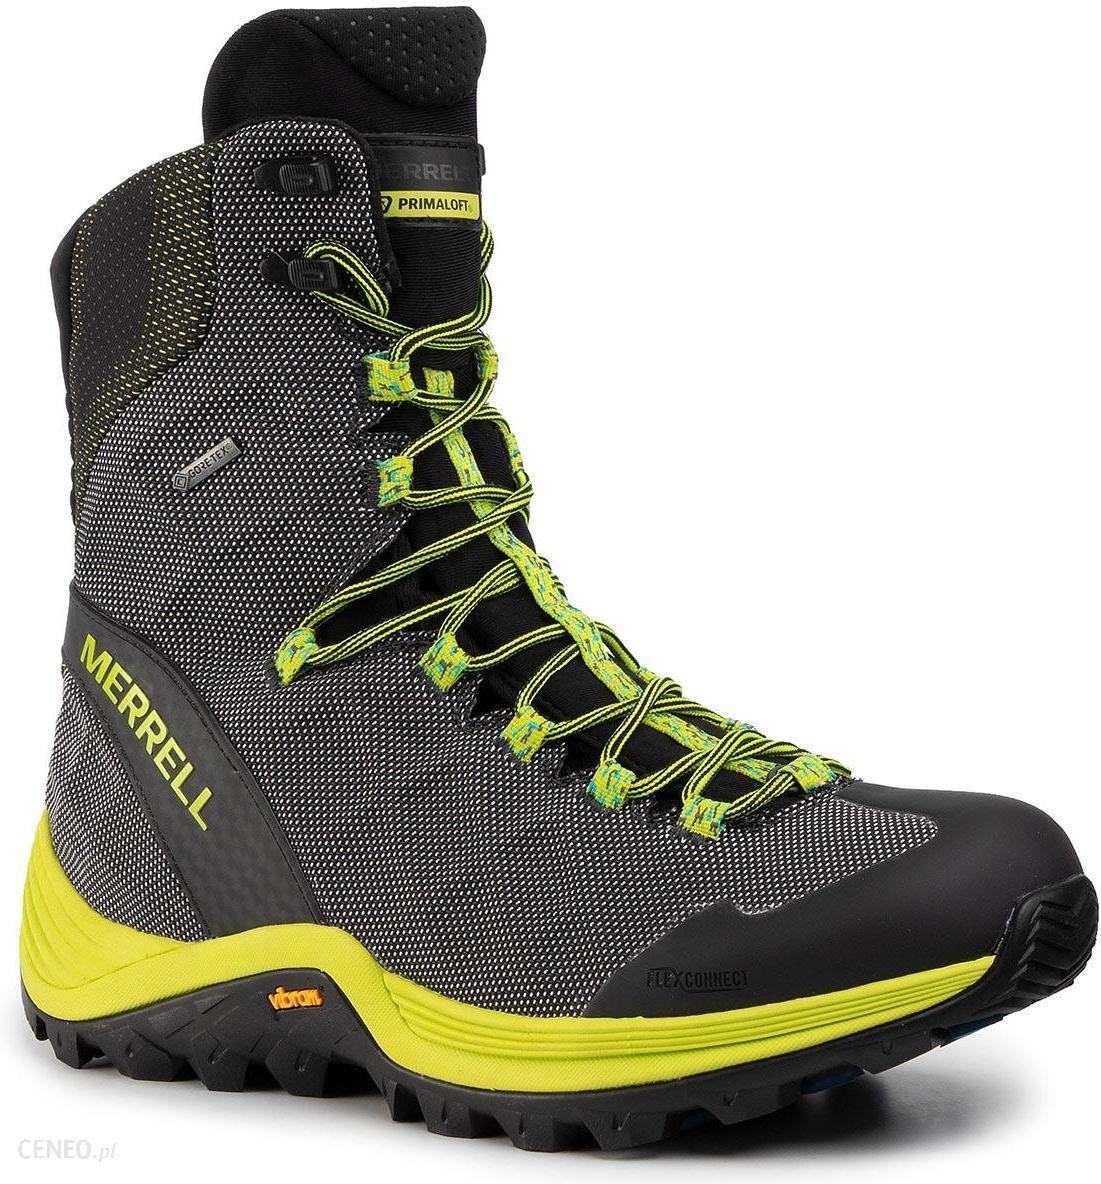 Buty trekkingowe Merrell Thermo Rogue Tall Gtx Gore Tex J17005 Sublime Ceny i opinie Ceneo.pl